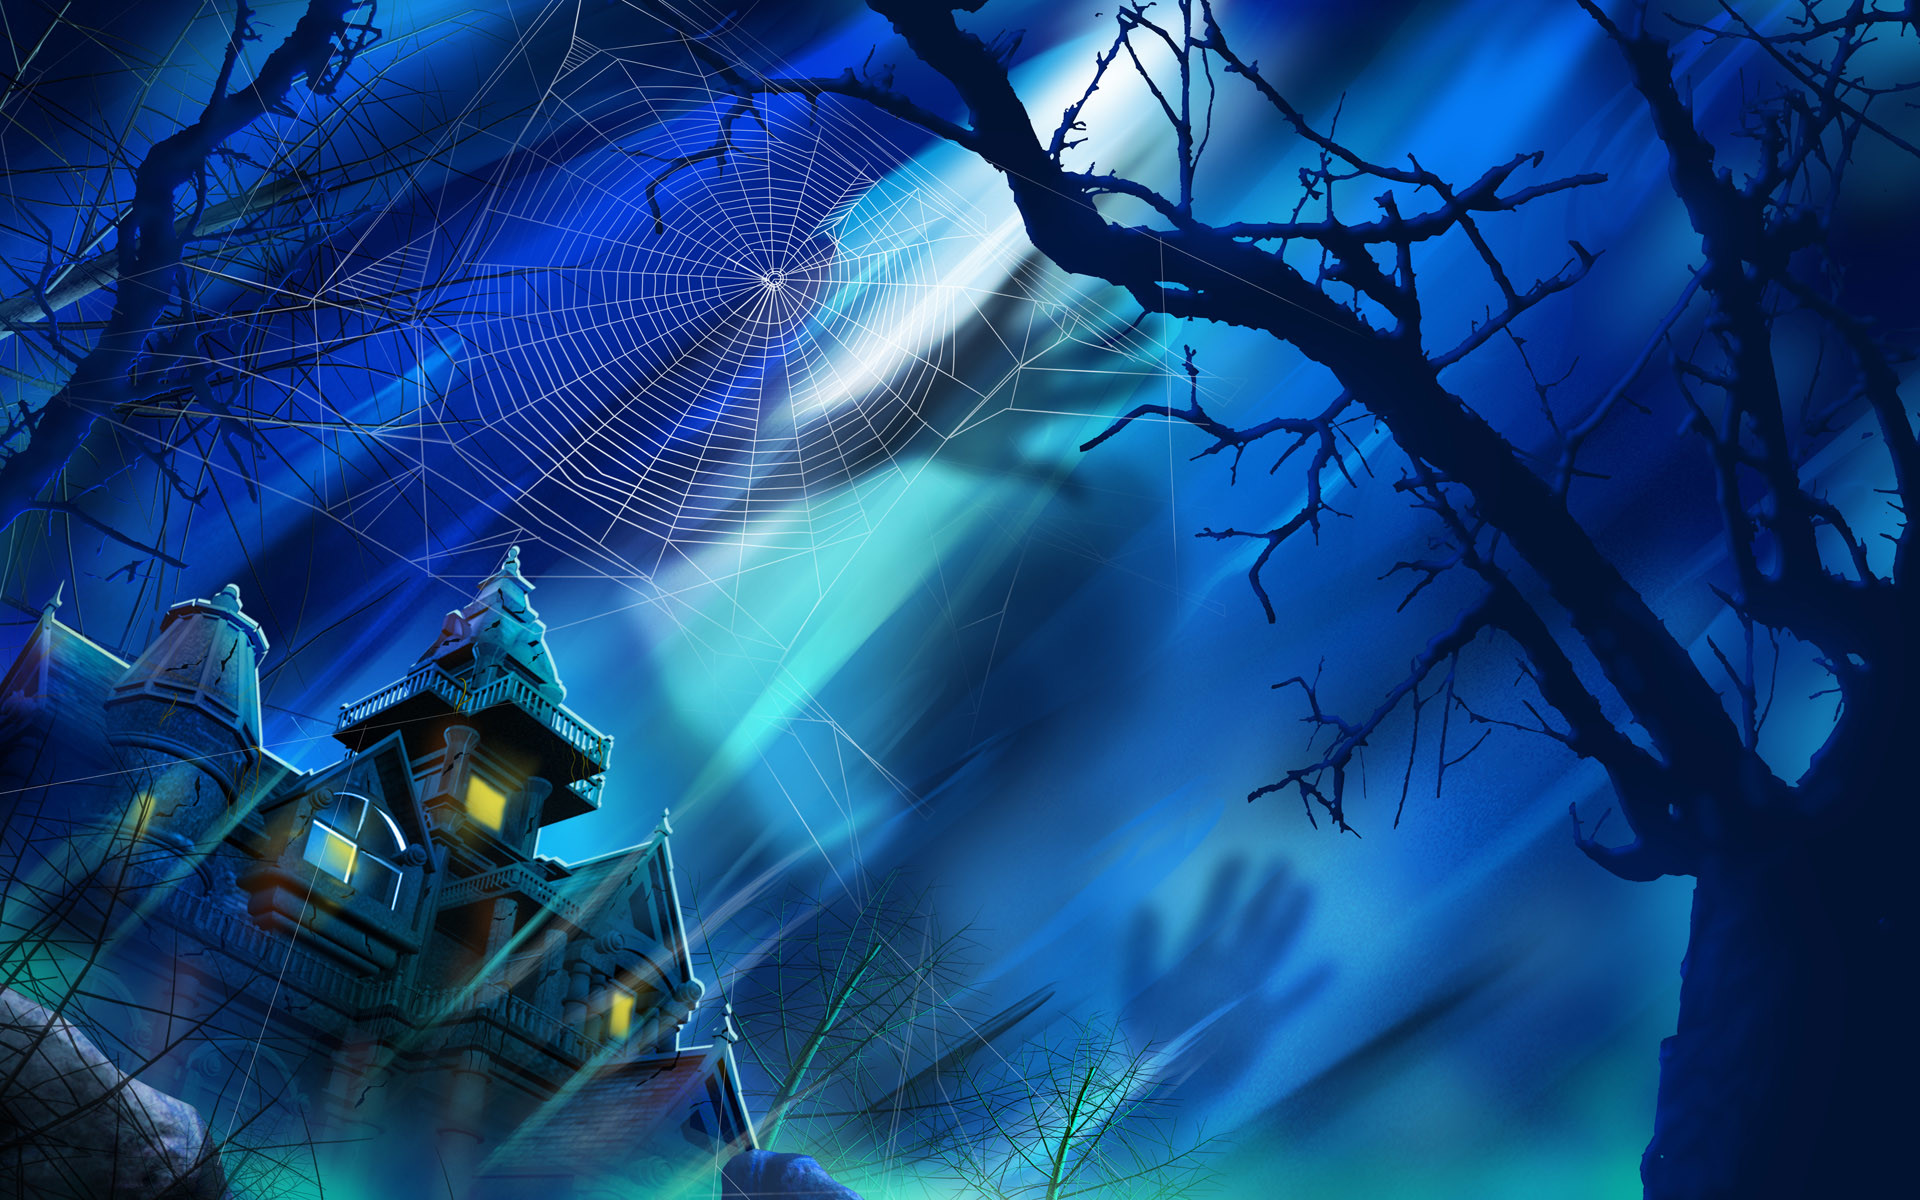 1920x1200 wallpapers screen savers halloween haunted screensavers mansion